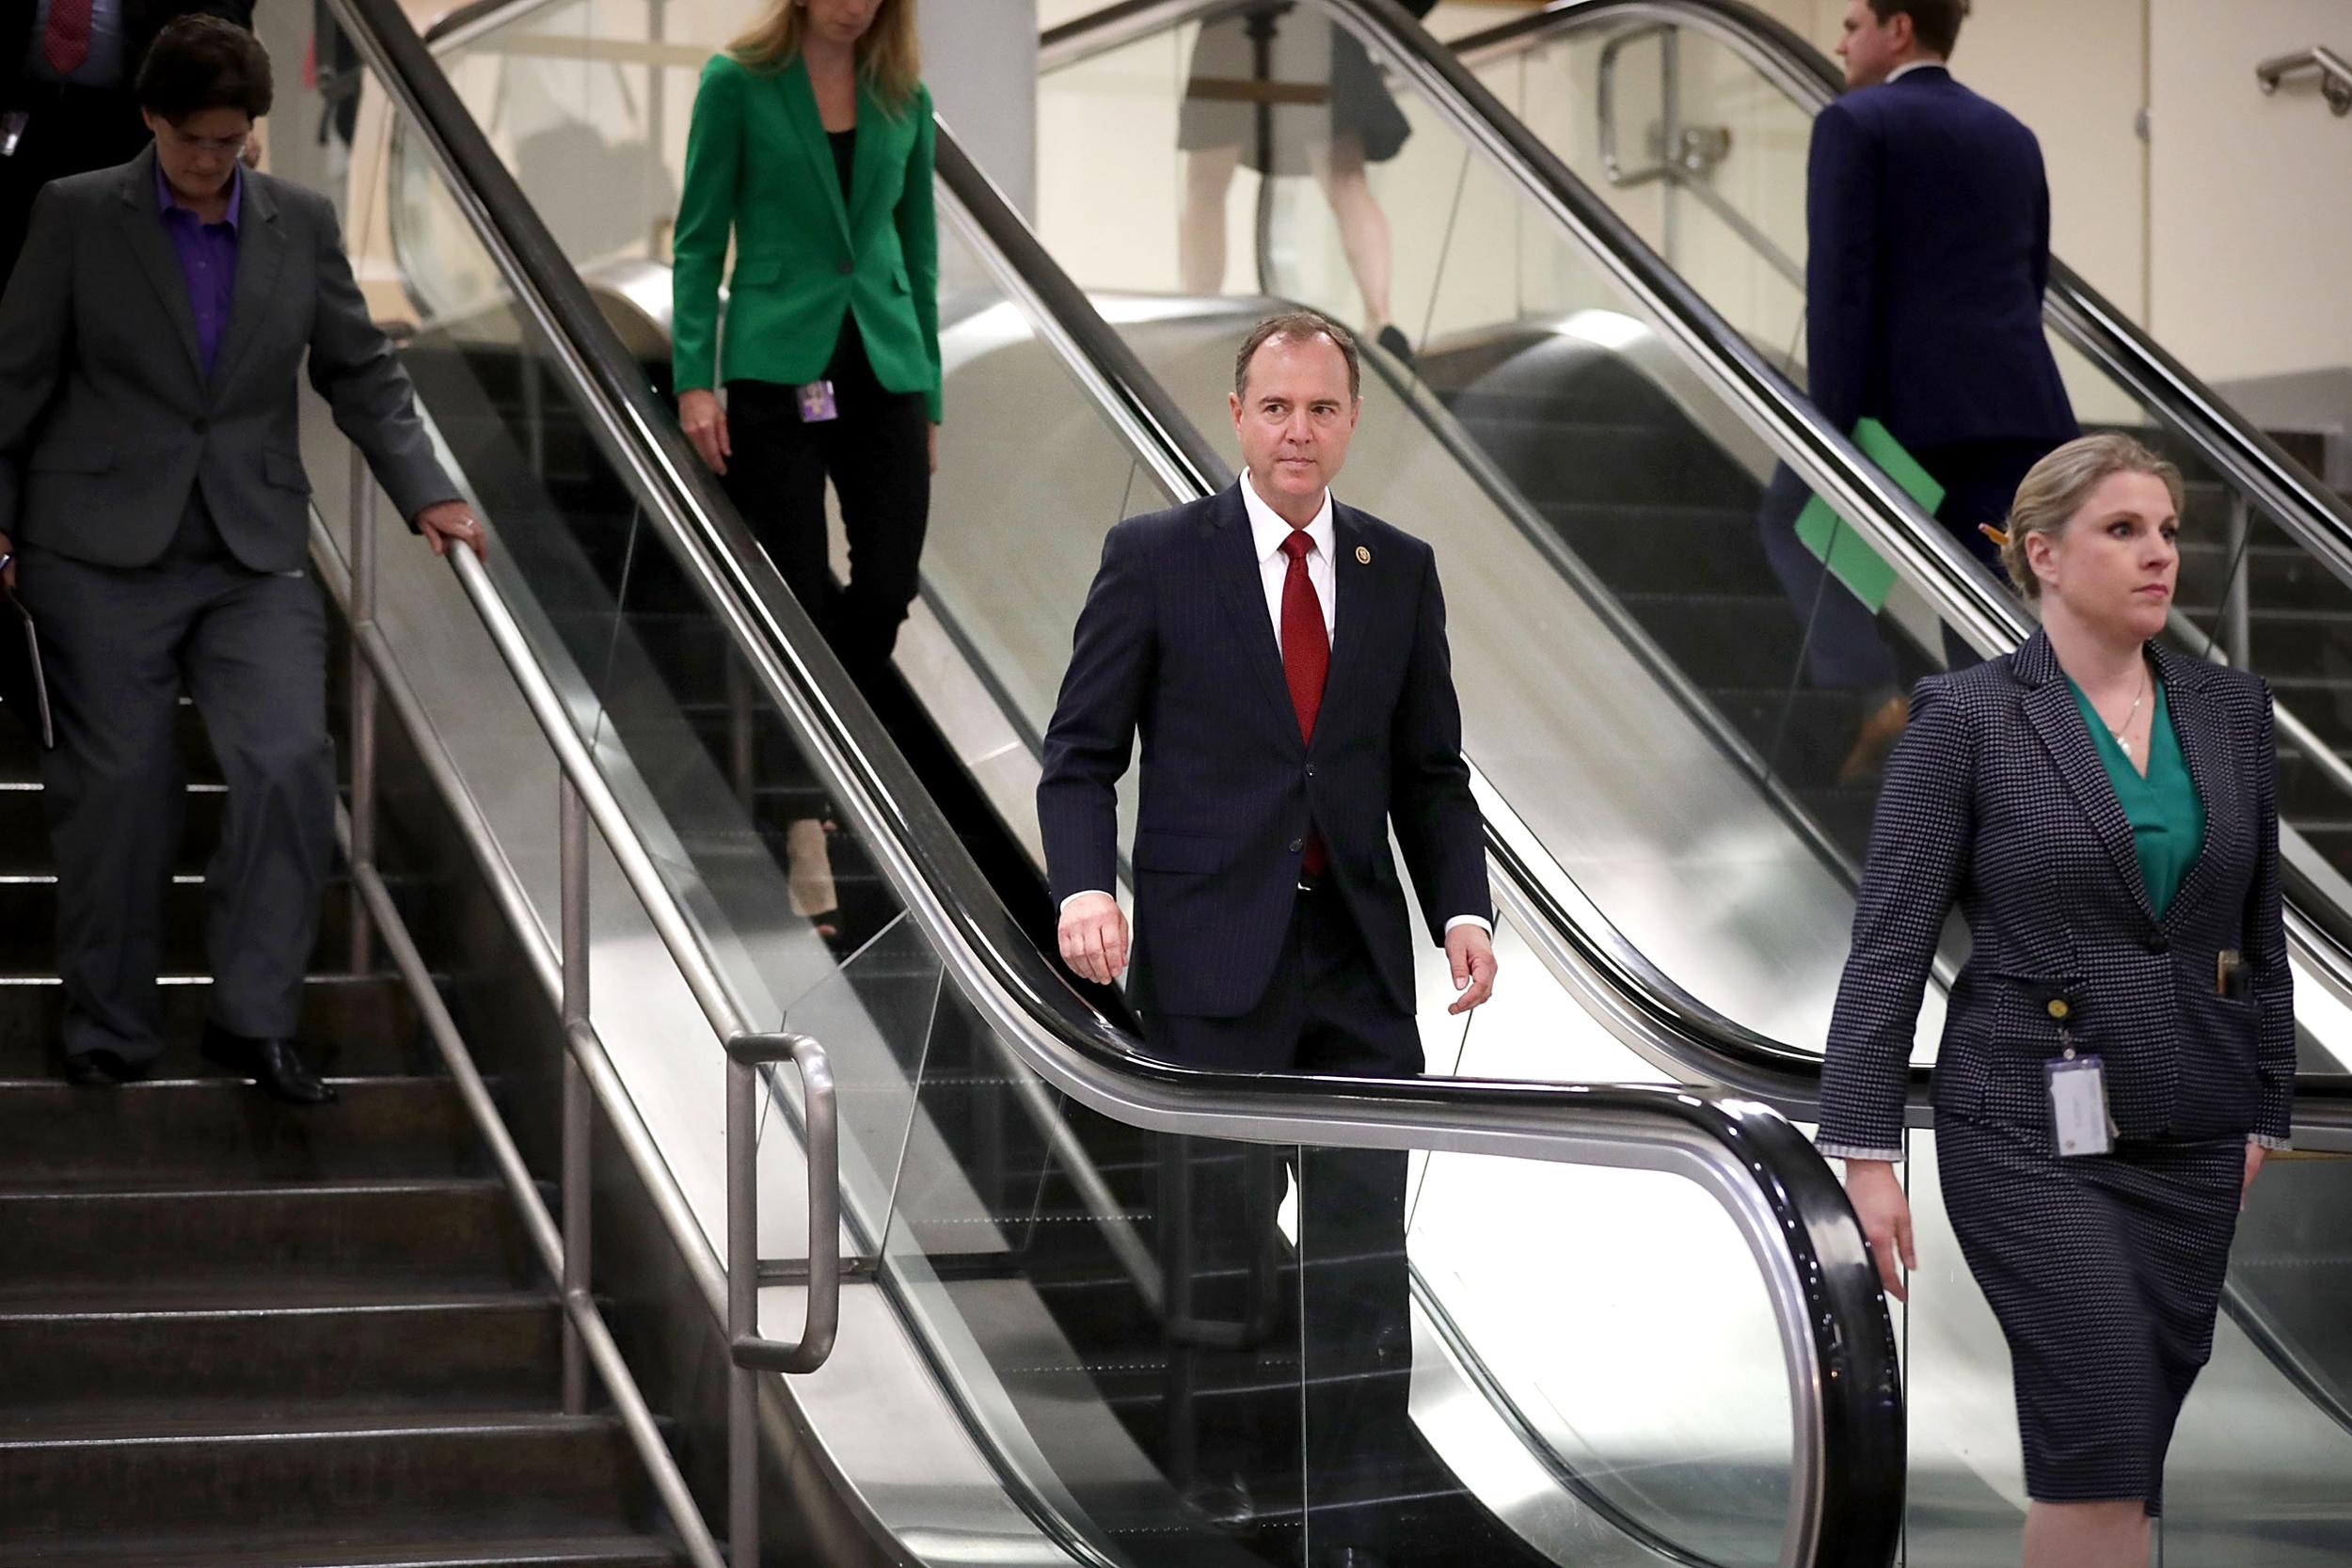 Schiff-to-Nunes:-Release-the-Russia-probe-interviews